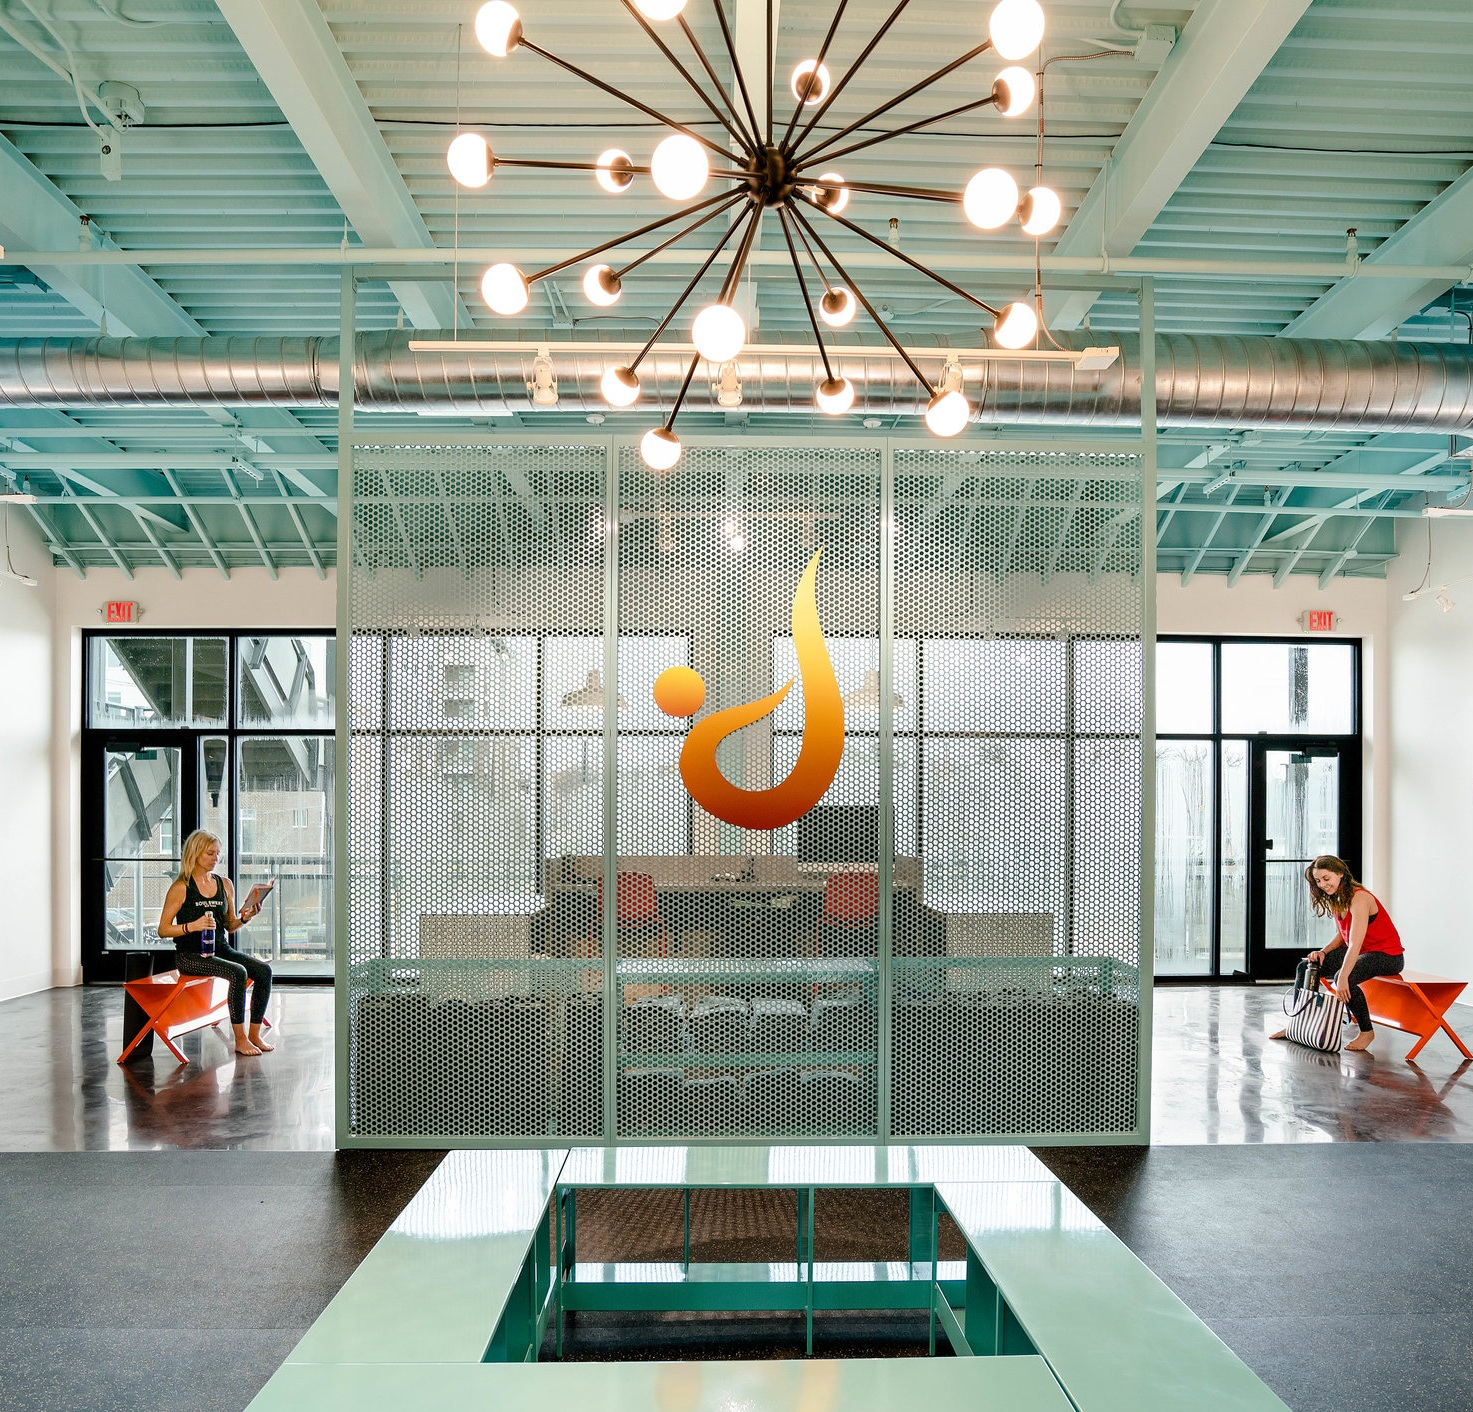 Yoga Studio Prep Drop Zone DesignJPG